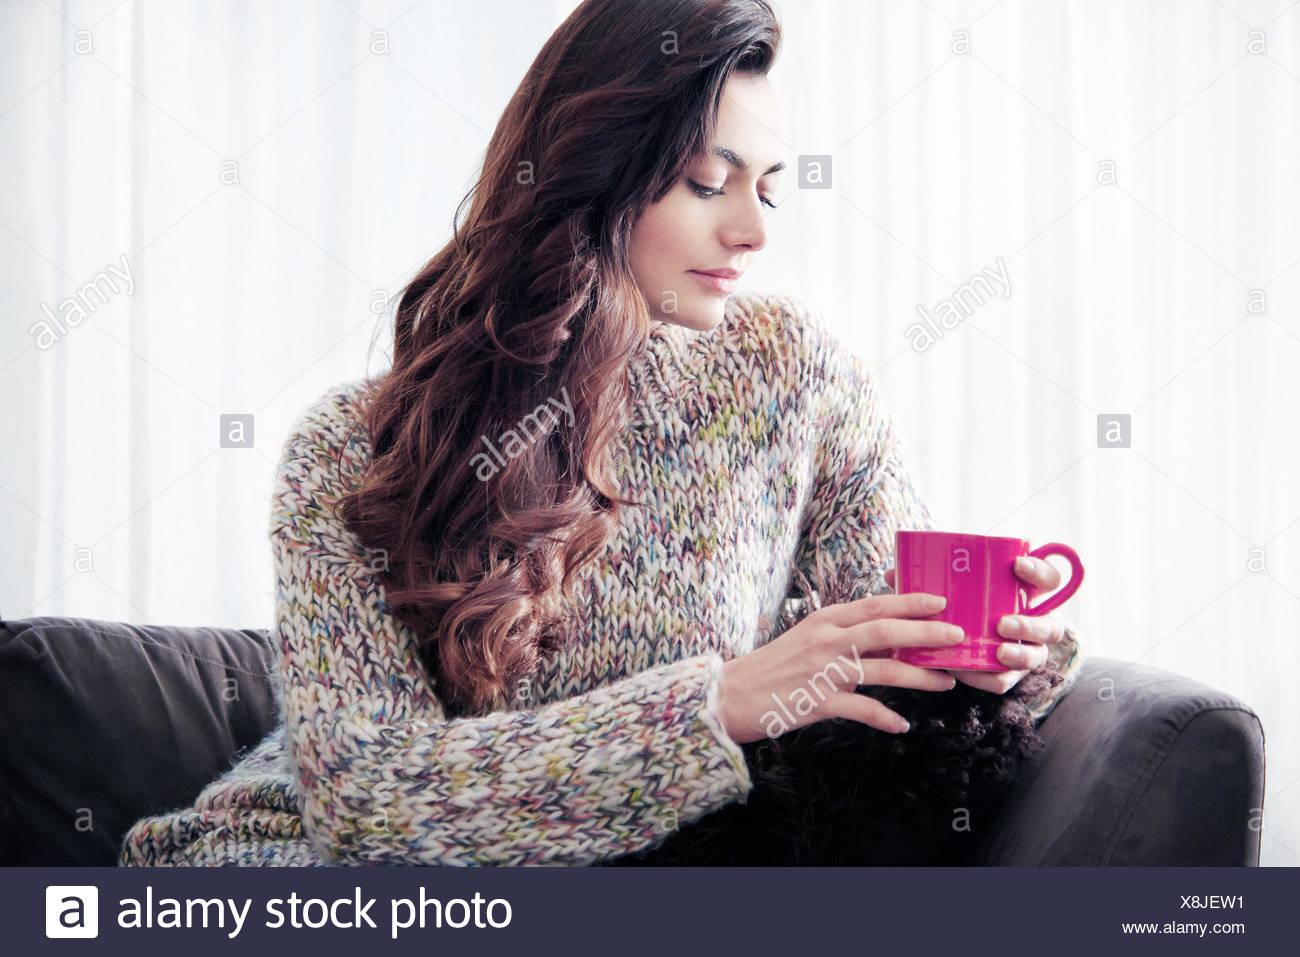 Woman drinking coffee on sofa - Stock Image